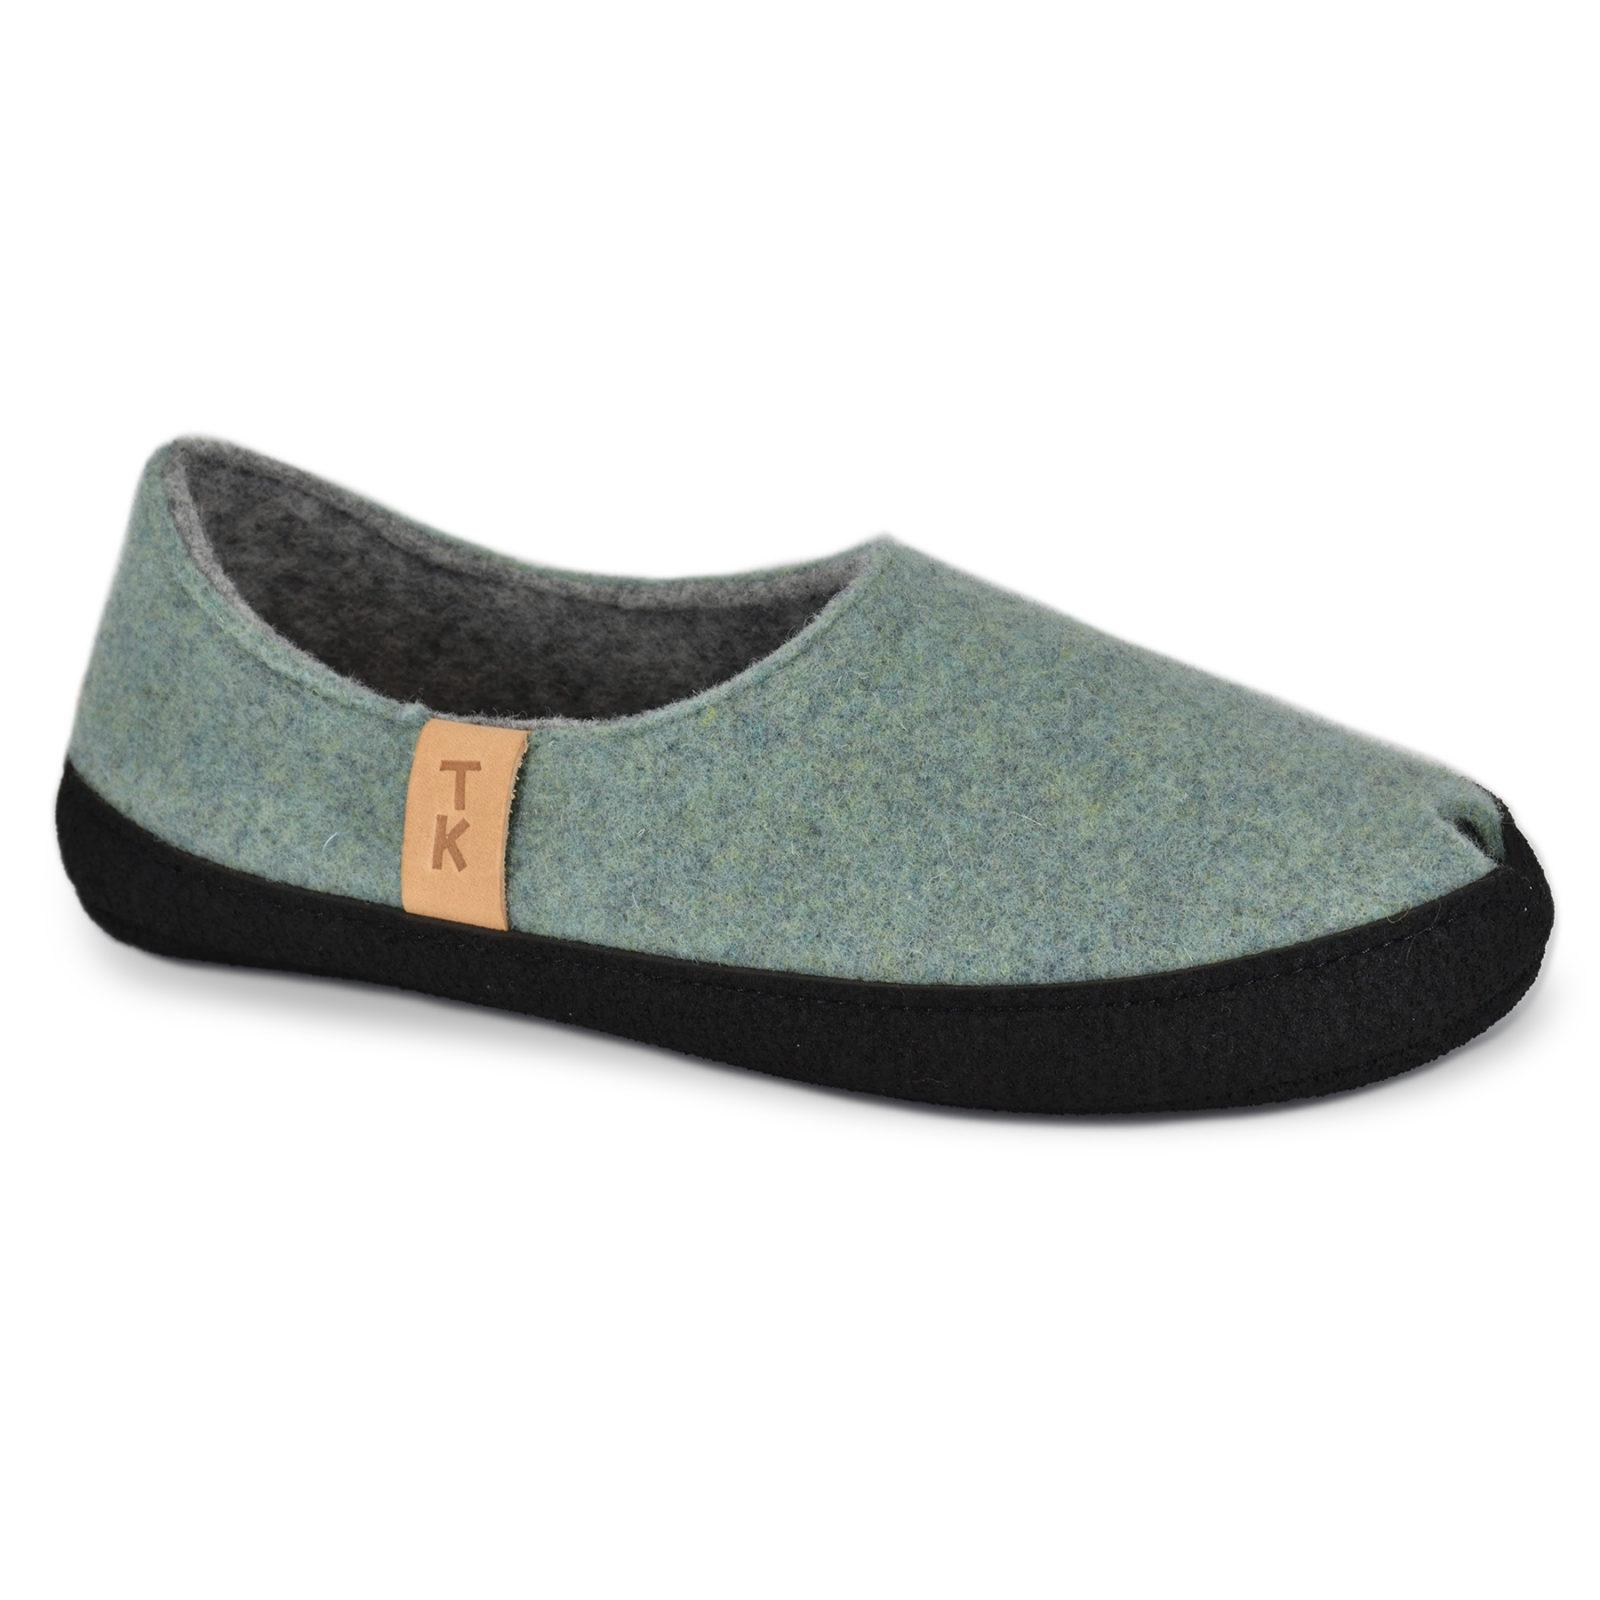 Toku-Budapest-indoor-slippers-v6